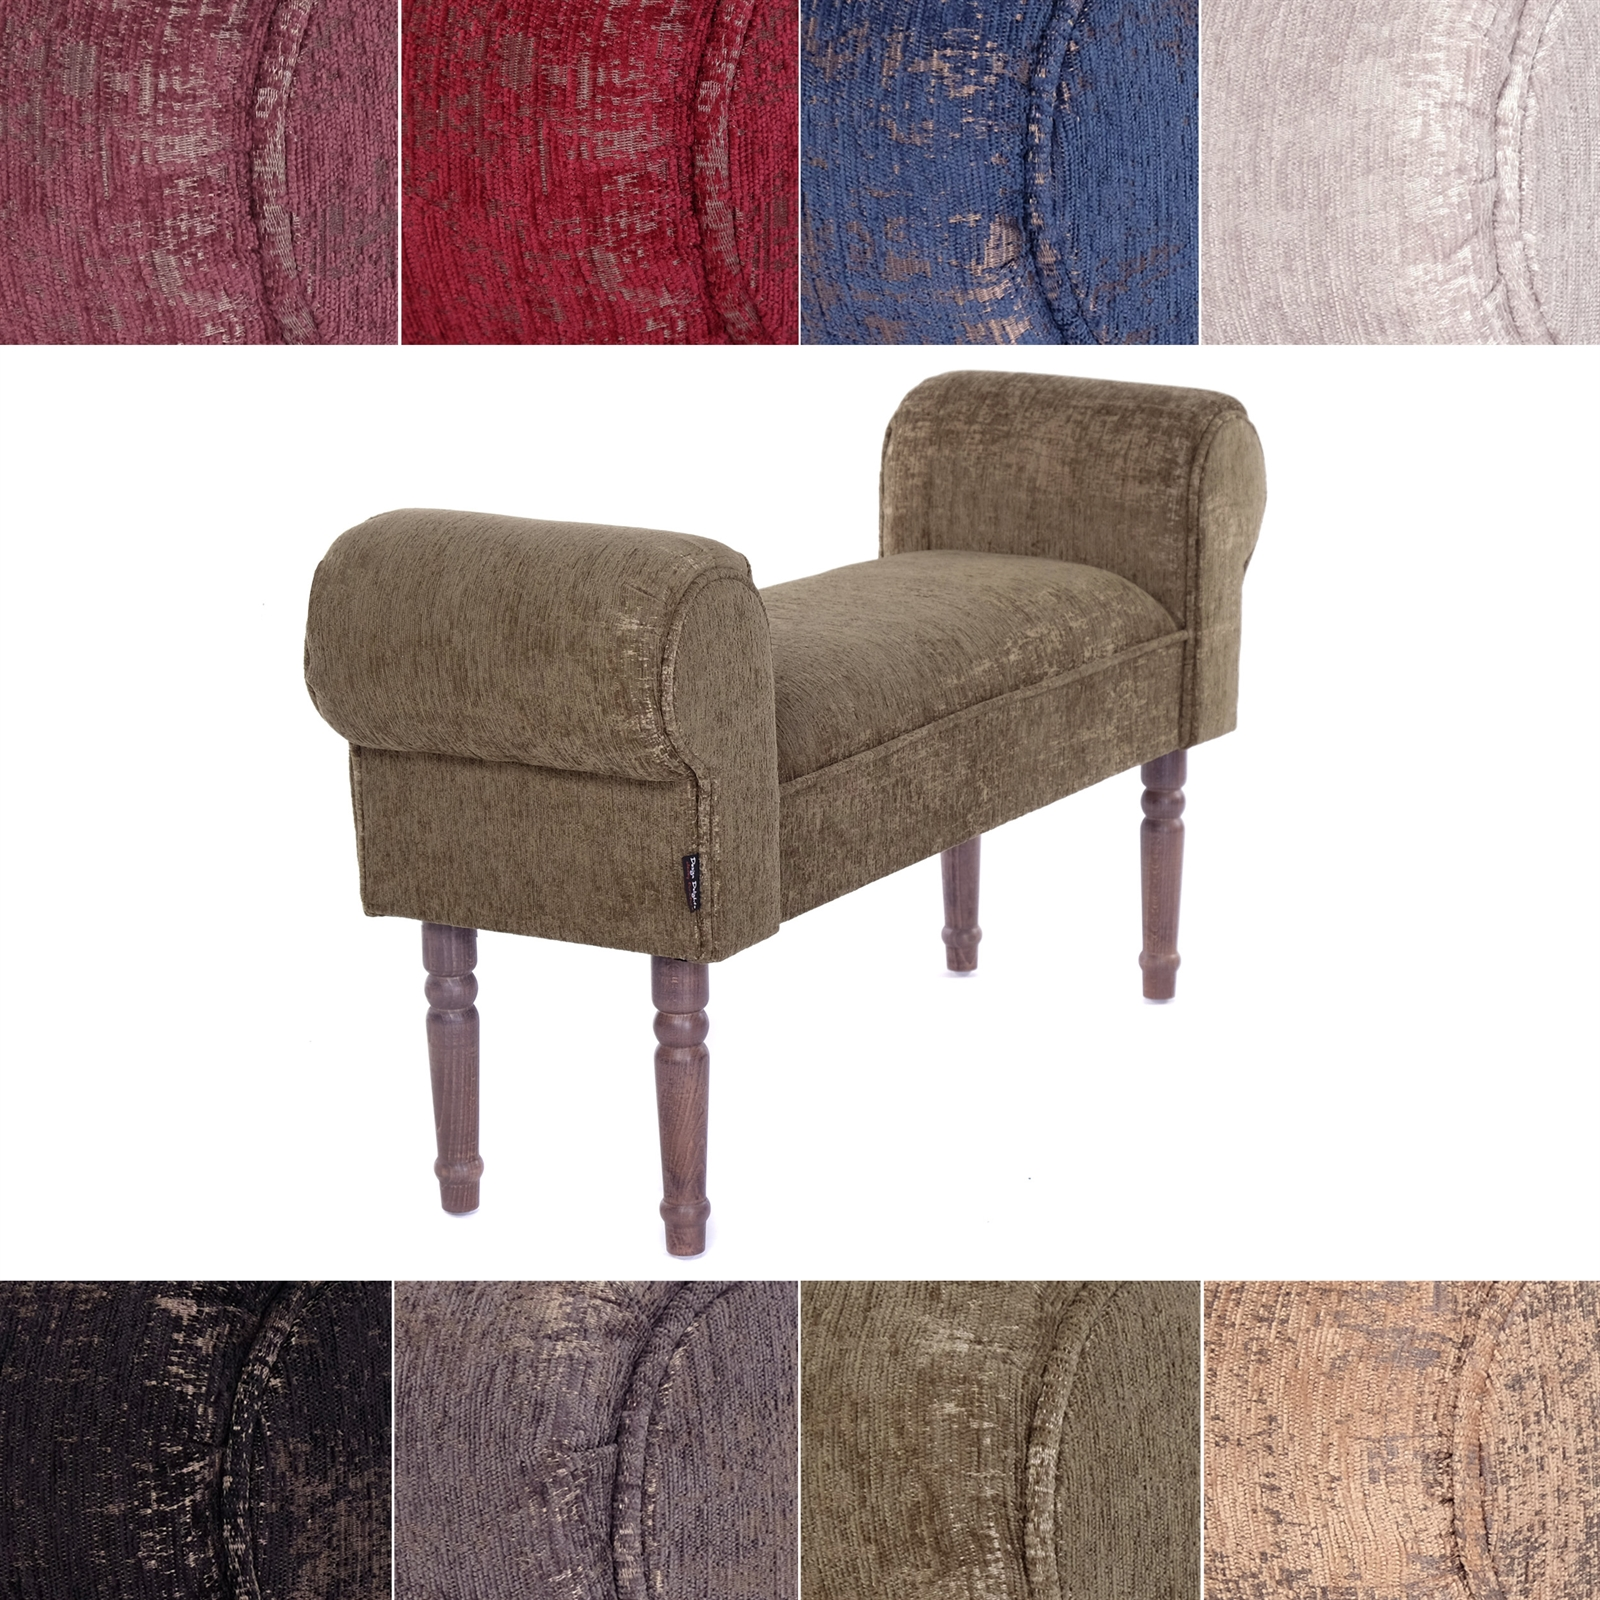 Design Seating Bench Ventura Upholstered Vanity Bench Ebay